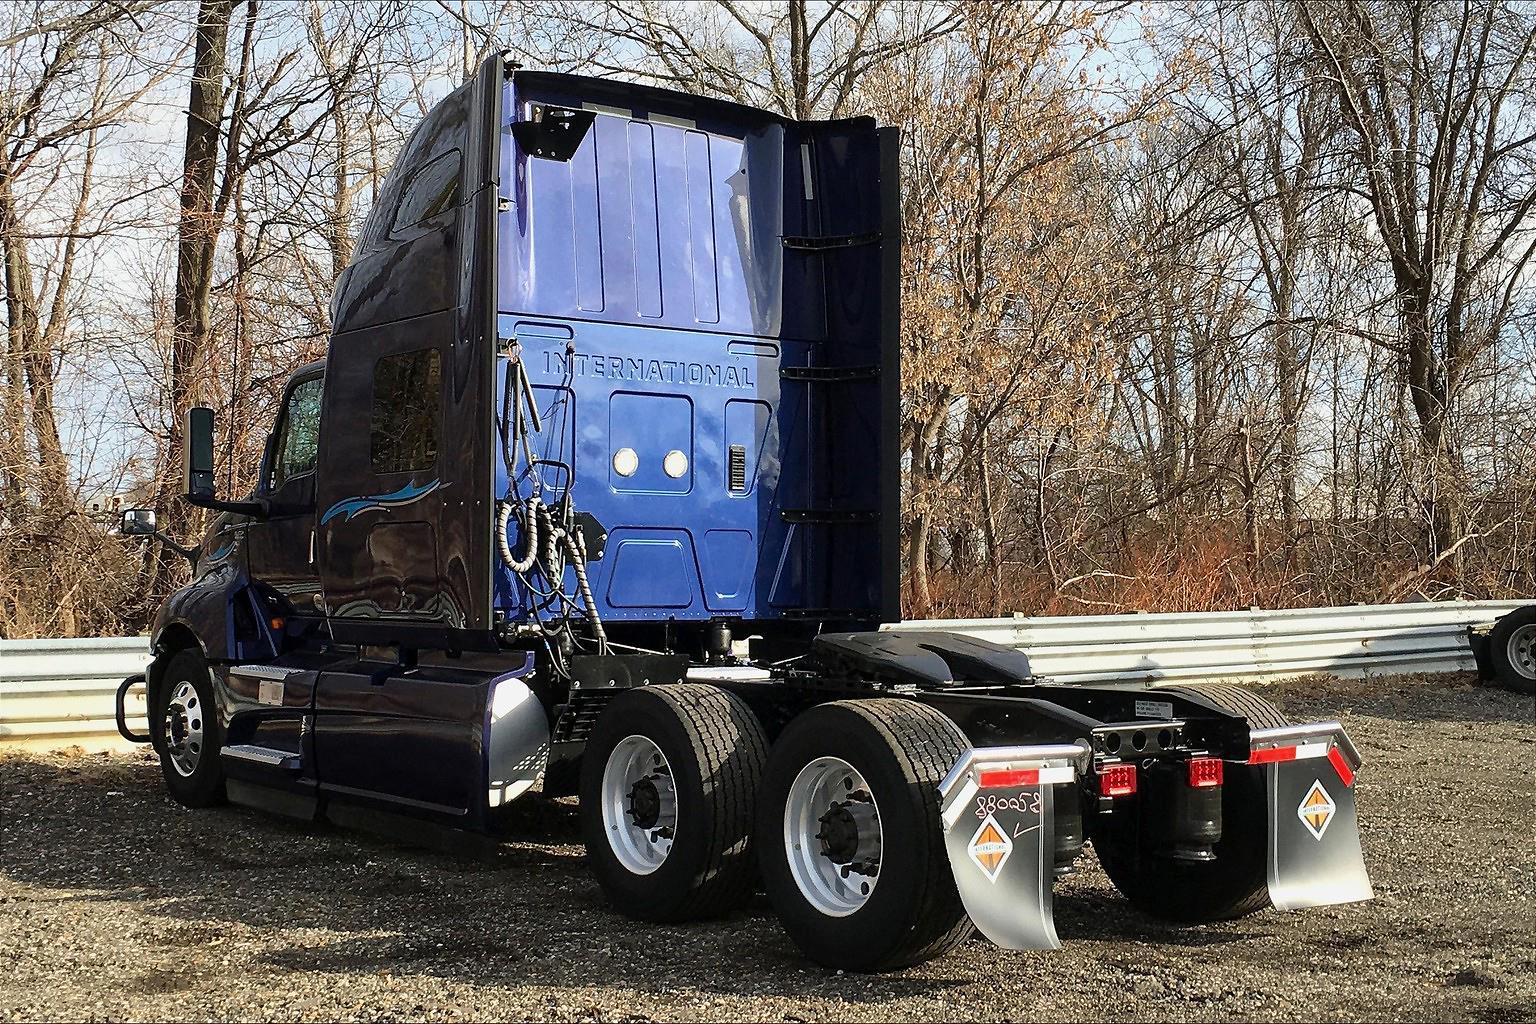 2018 International LT 6x4, Tractor #JN435607 - photo 1